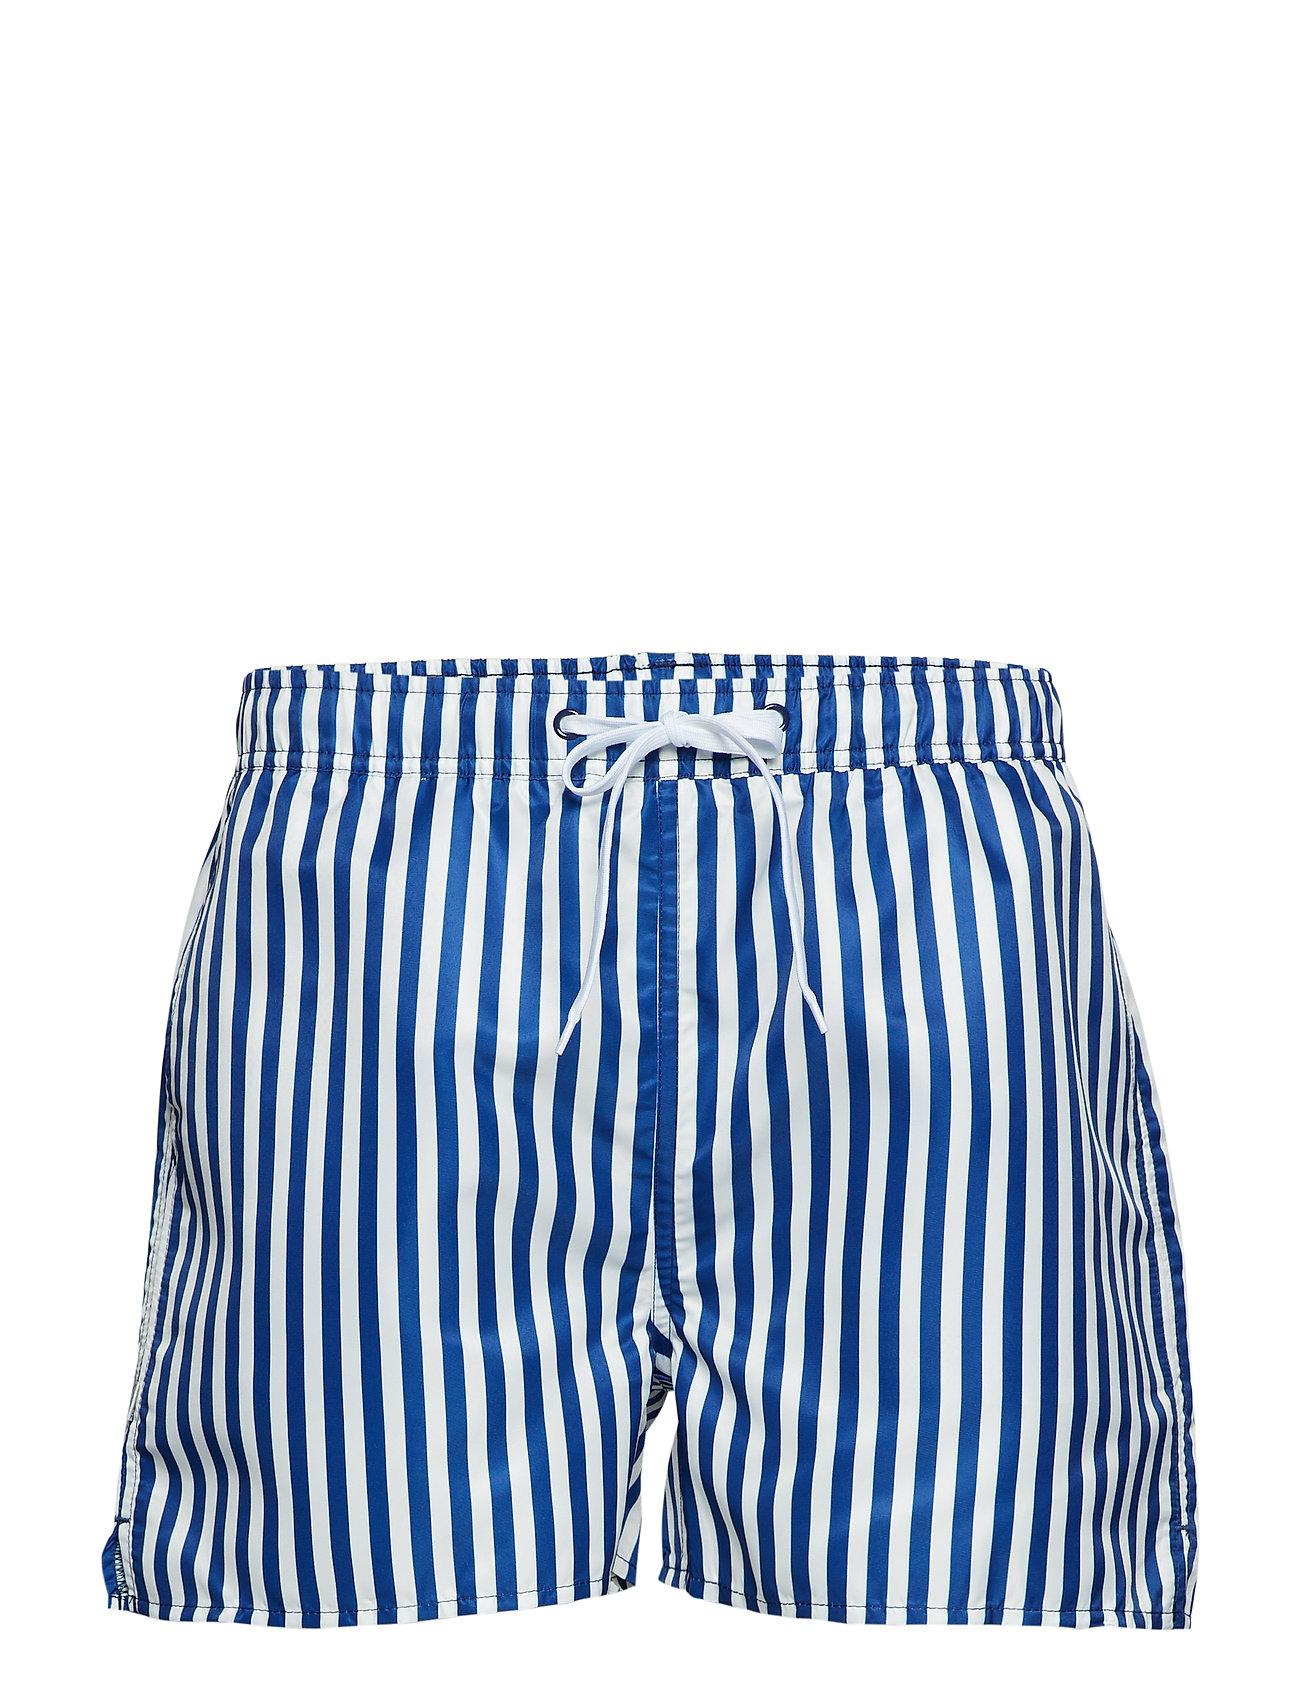 Resteröds Swimwear - COBALT ST